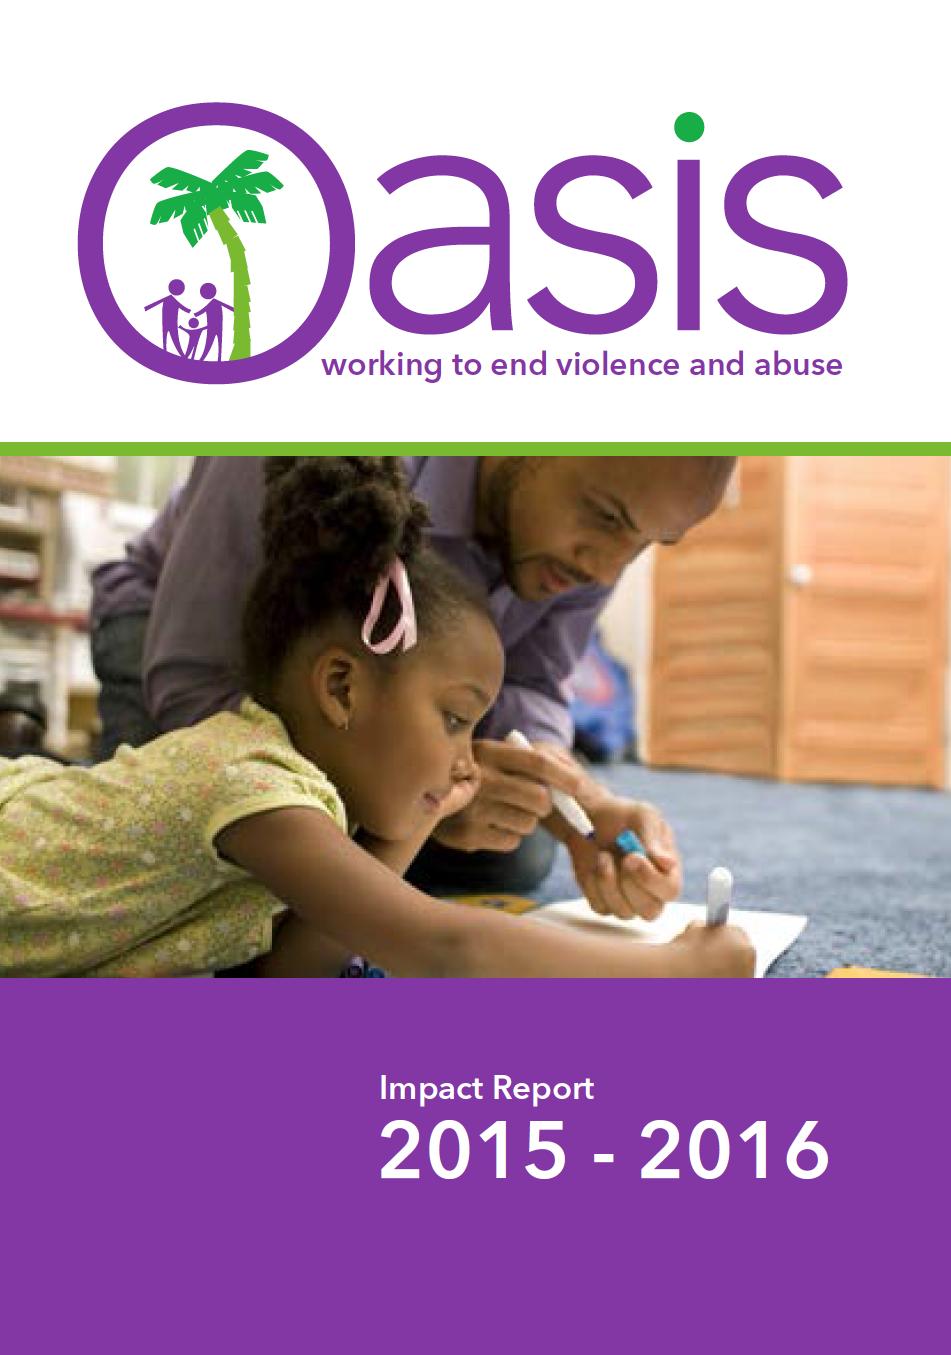 Oasis impact report 2015-2016